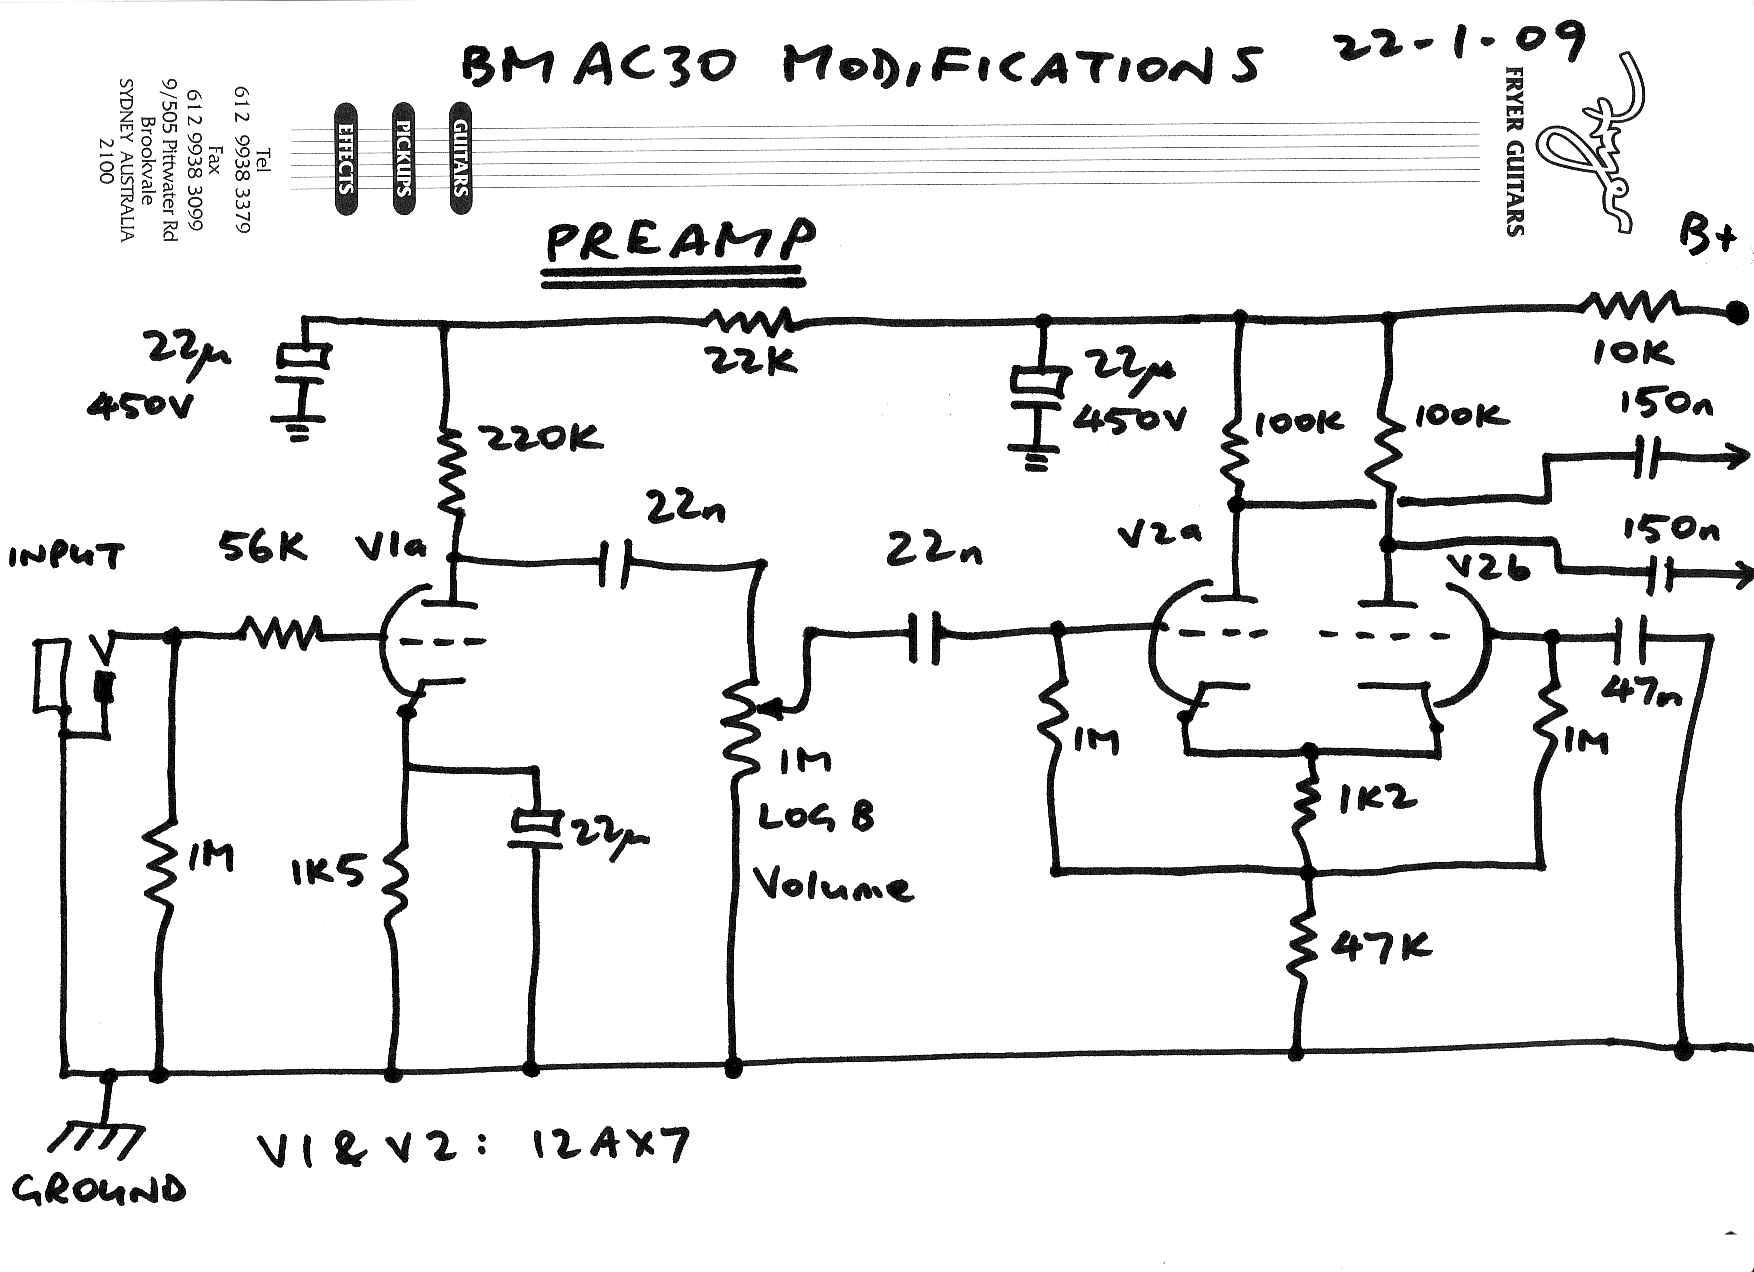 Vox Amp Schematics Great Design Of Wiring Diagram Guitar Ad50vt Schematic Mesa Boogie Studio Preamp Ac30 Top Boost